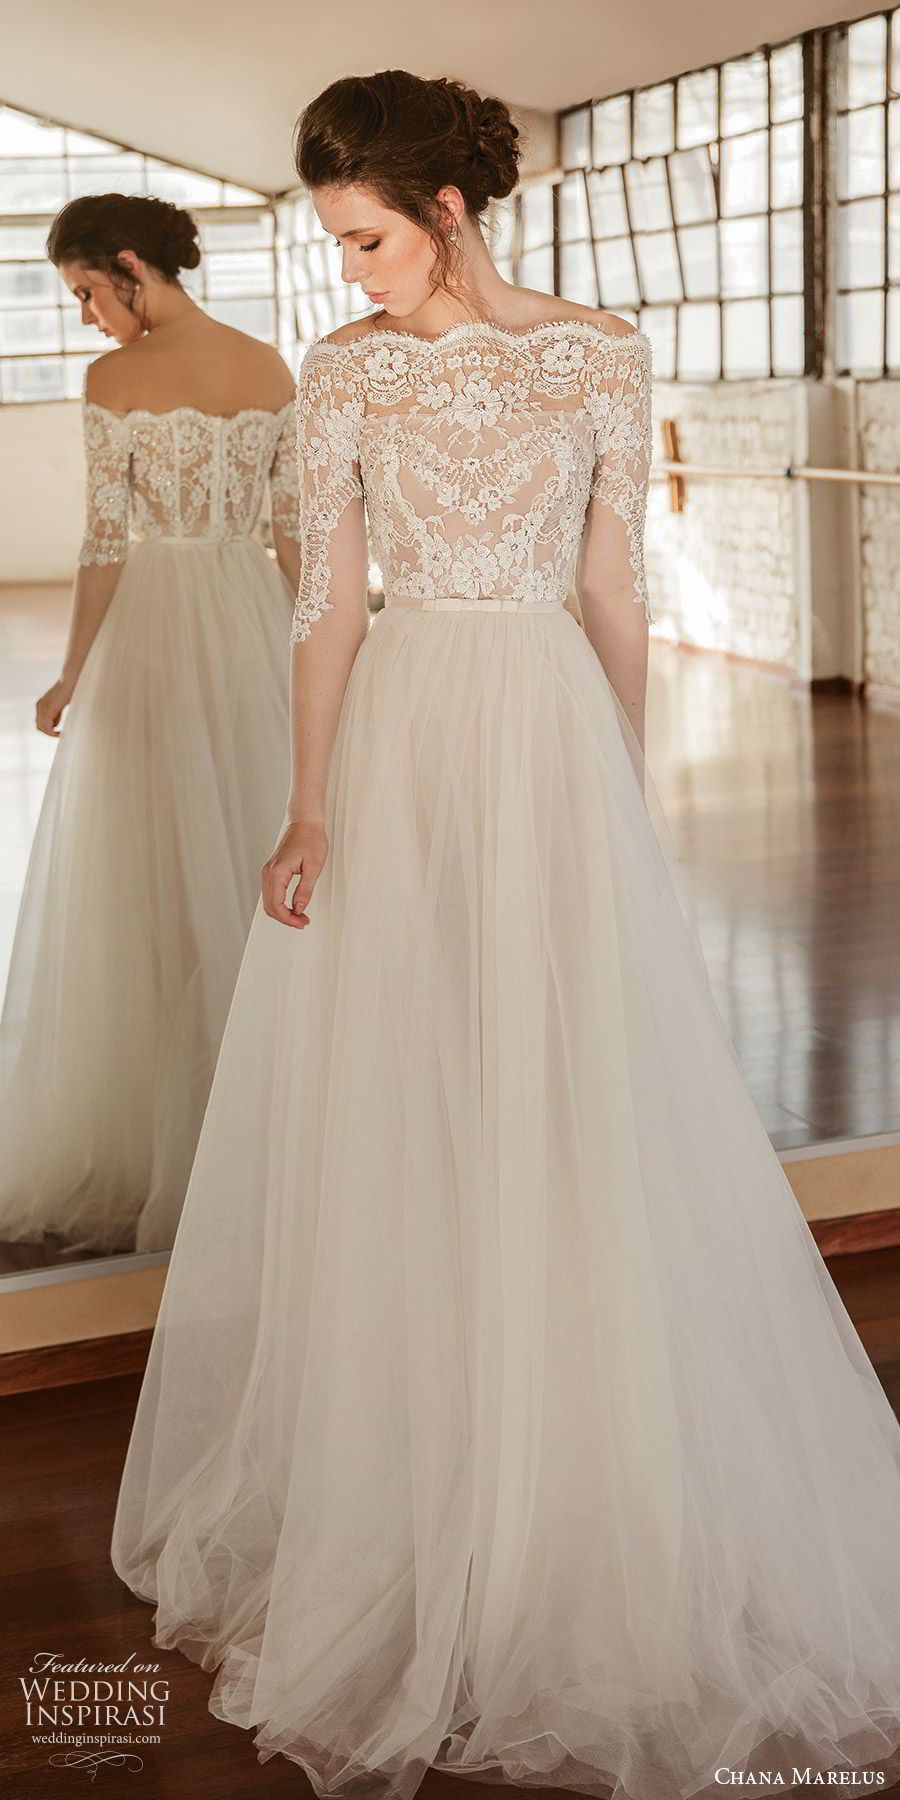 Photo of Chana Marelus Fall/Winter 2019 Wedding Dresses | Wedding Inspirasi